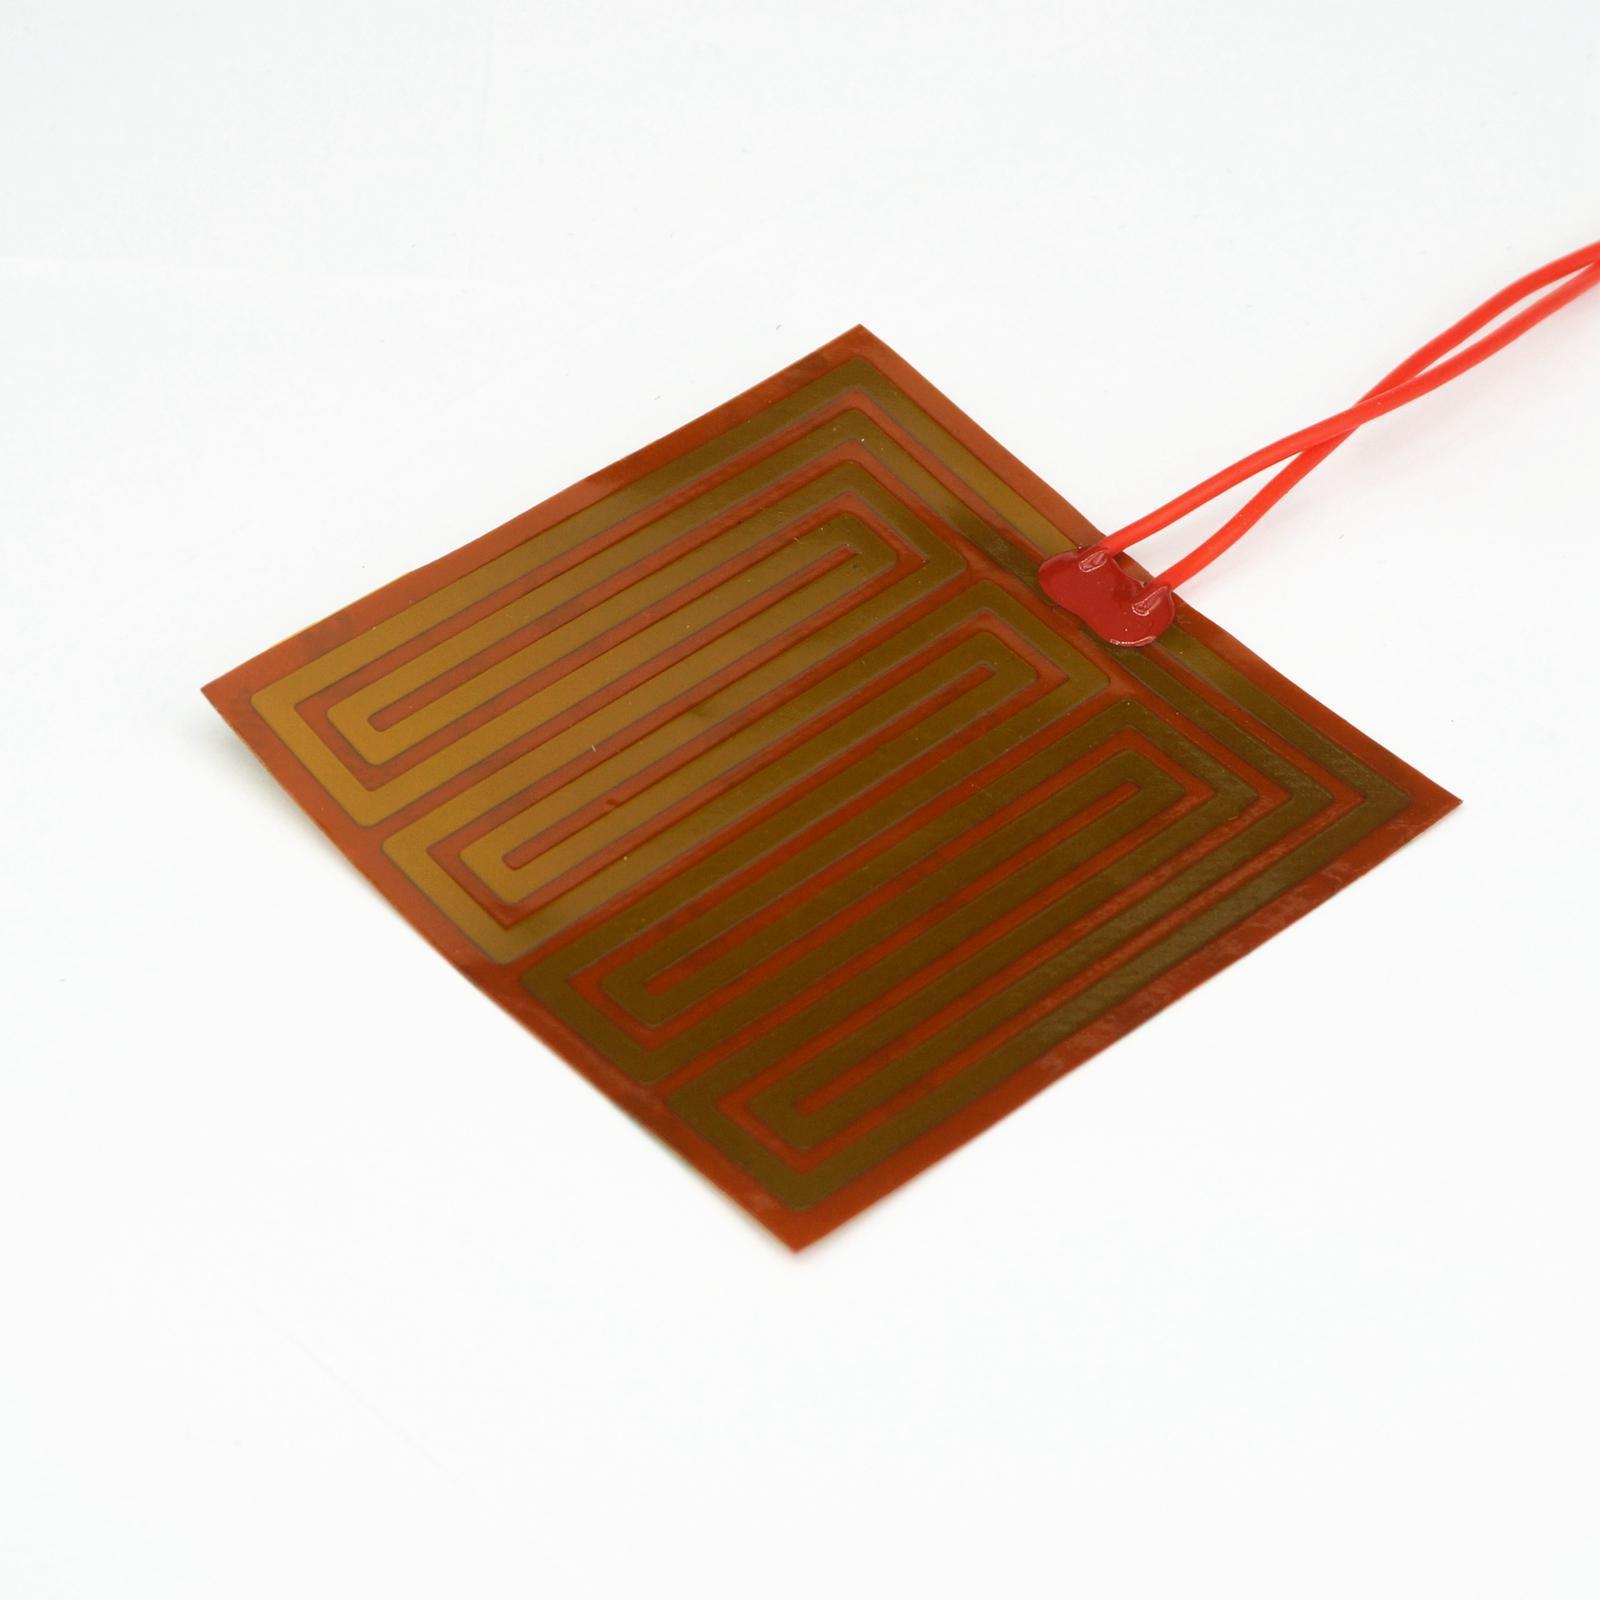 100x100mm 90 watt 12 v DC Flexiable Eeletric Polyimid Film Heizung Heizung element für Elektrische Drähte